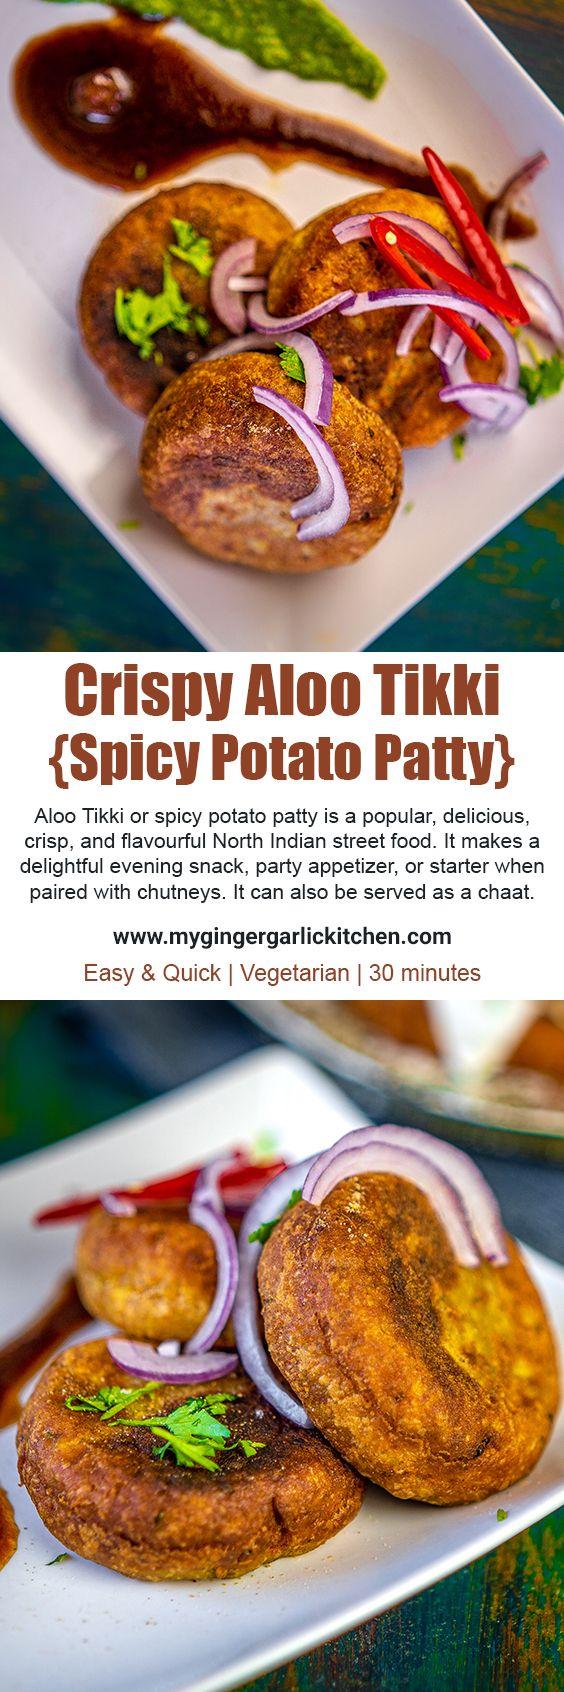 crispy aloo tikki spicy potato patty in 2020 food recipes indian food recipes on hebbar s kitchen recipes aloo tikki id=46617